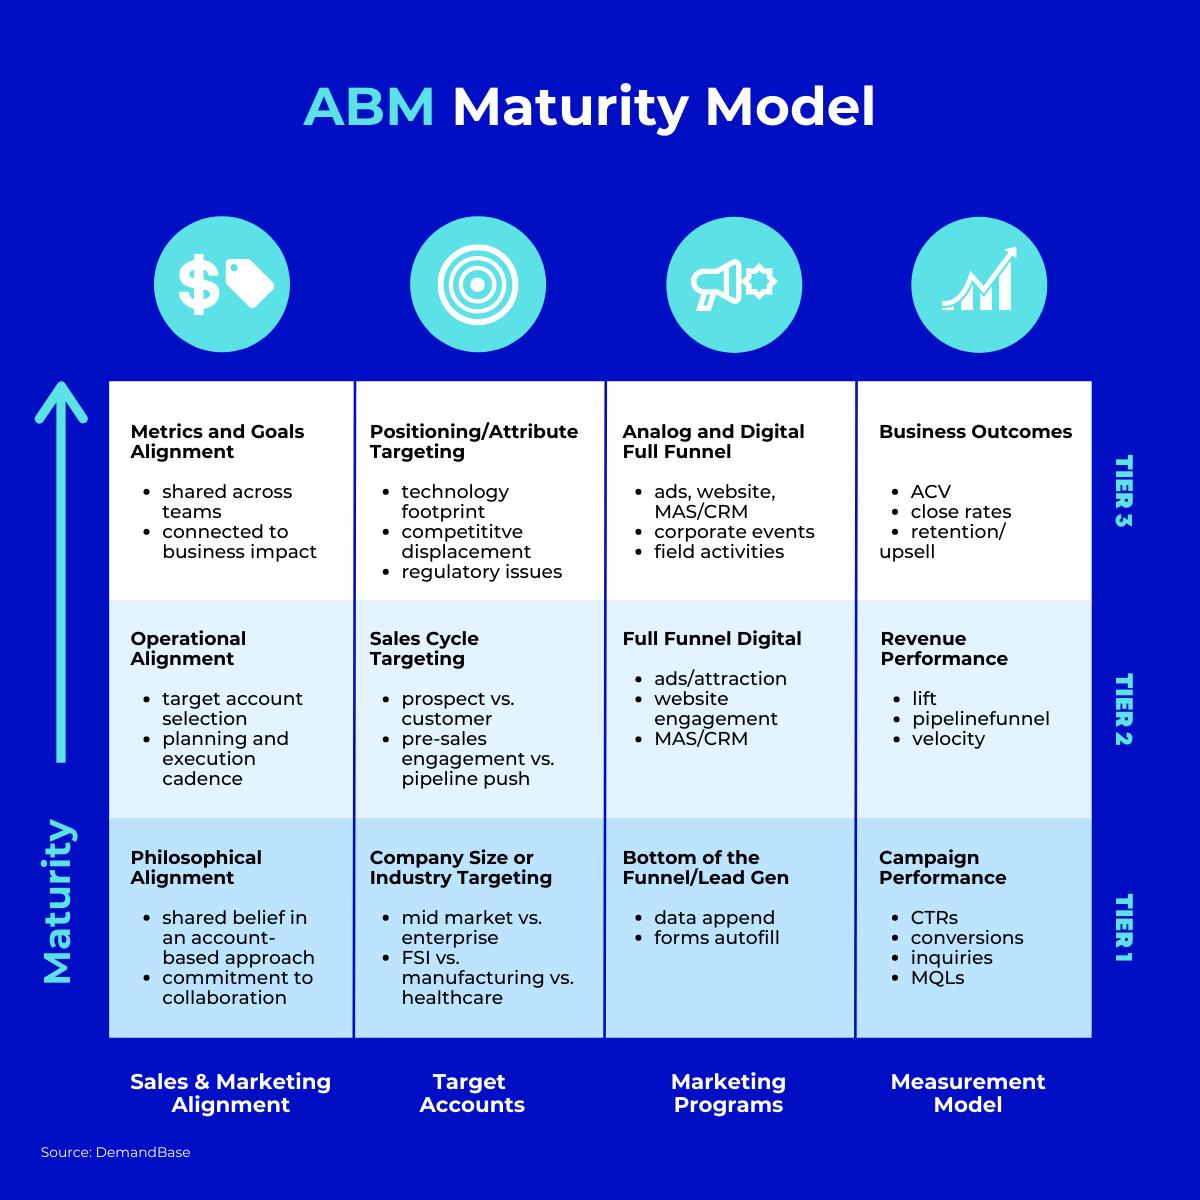 ABM Maturity Model